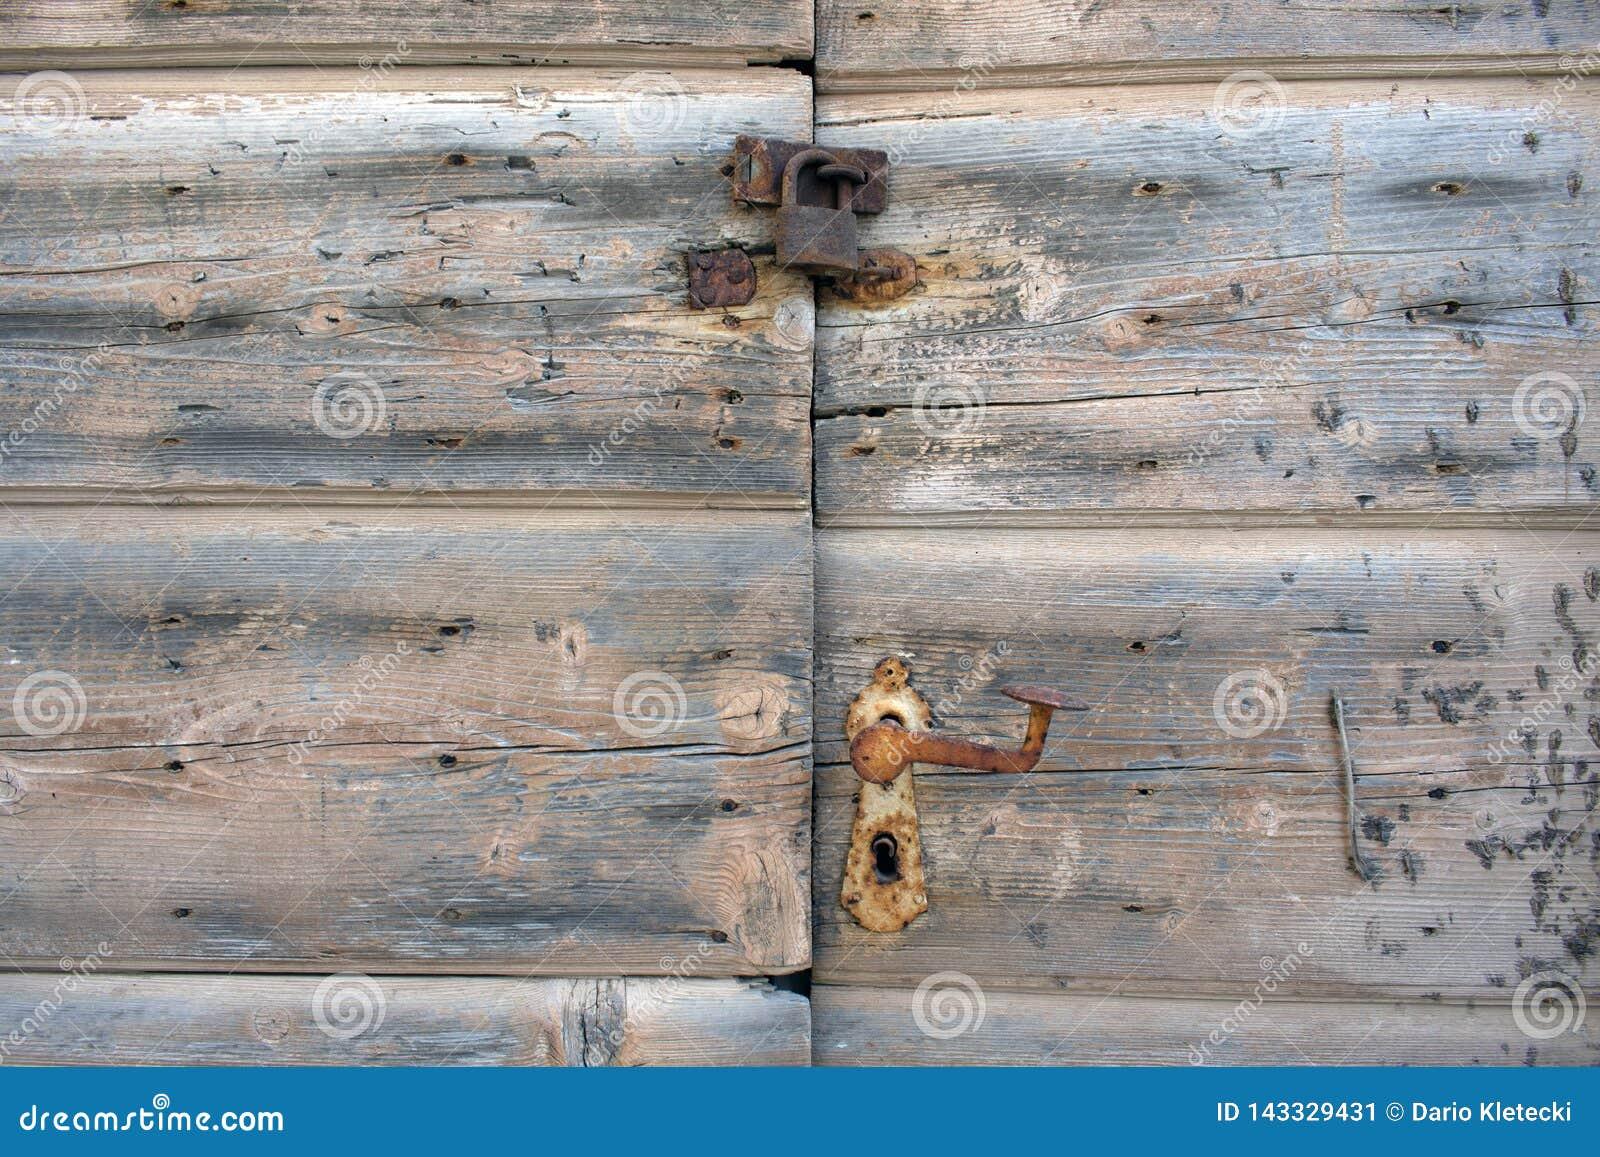 Rusty lock on old wooden doorsc